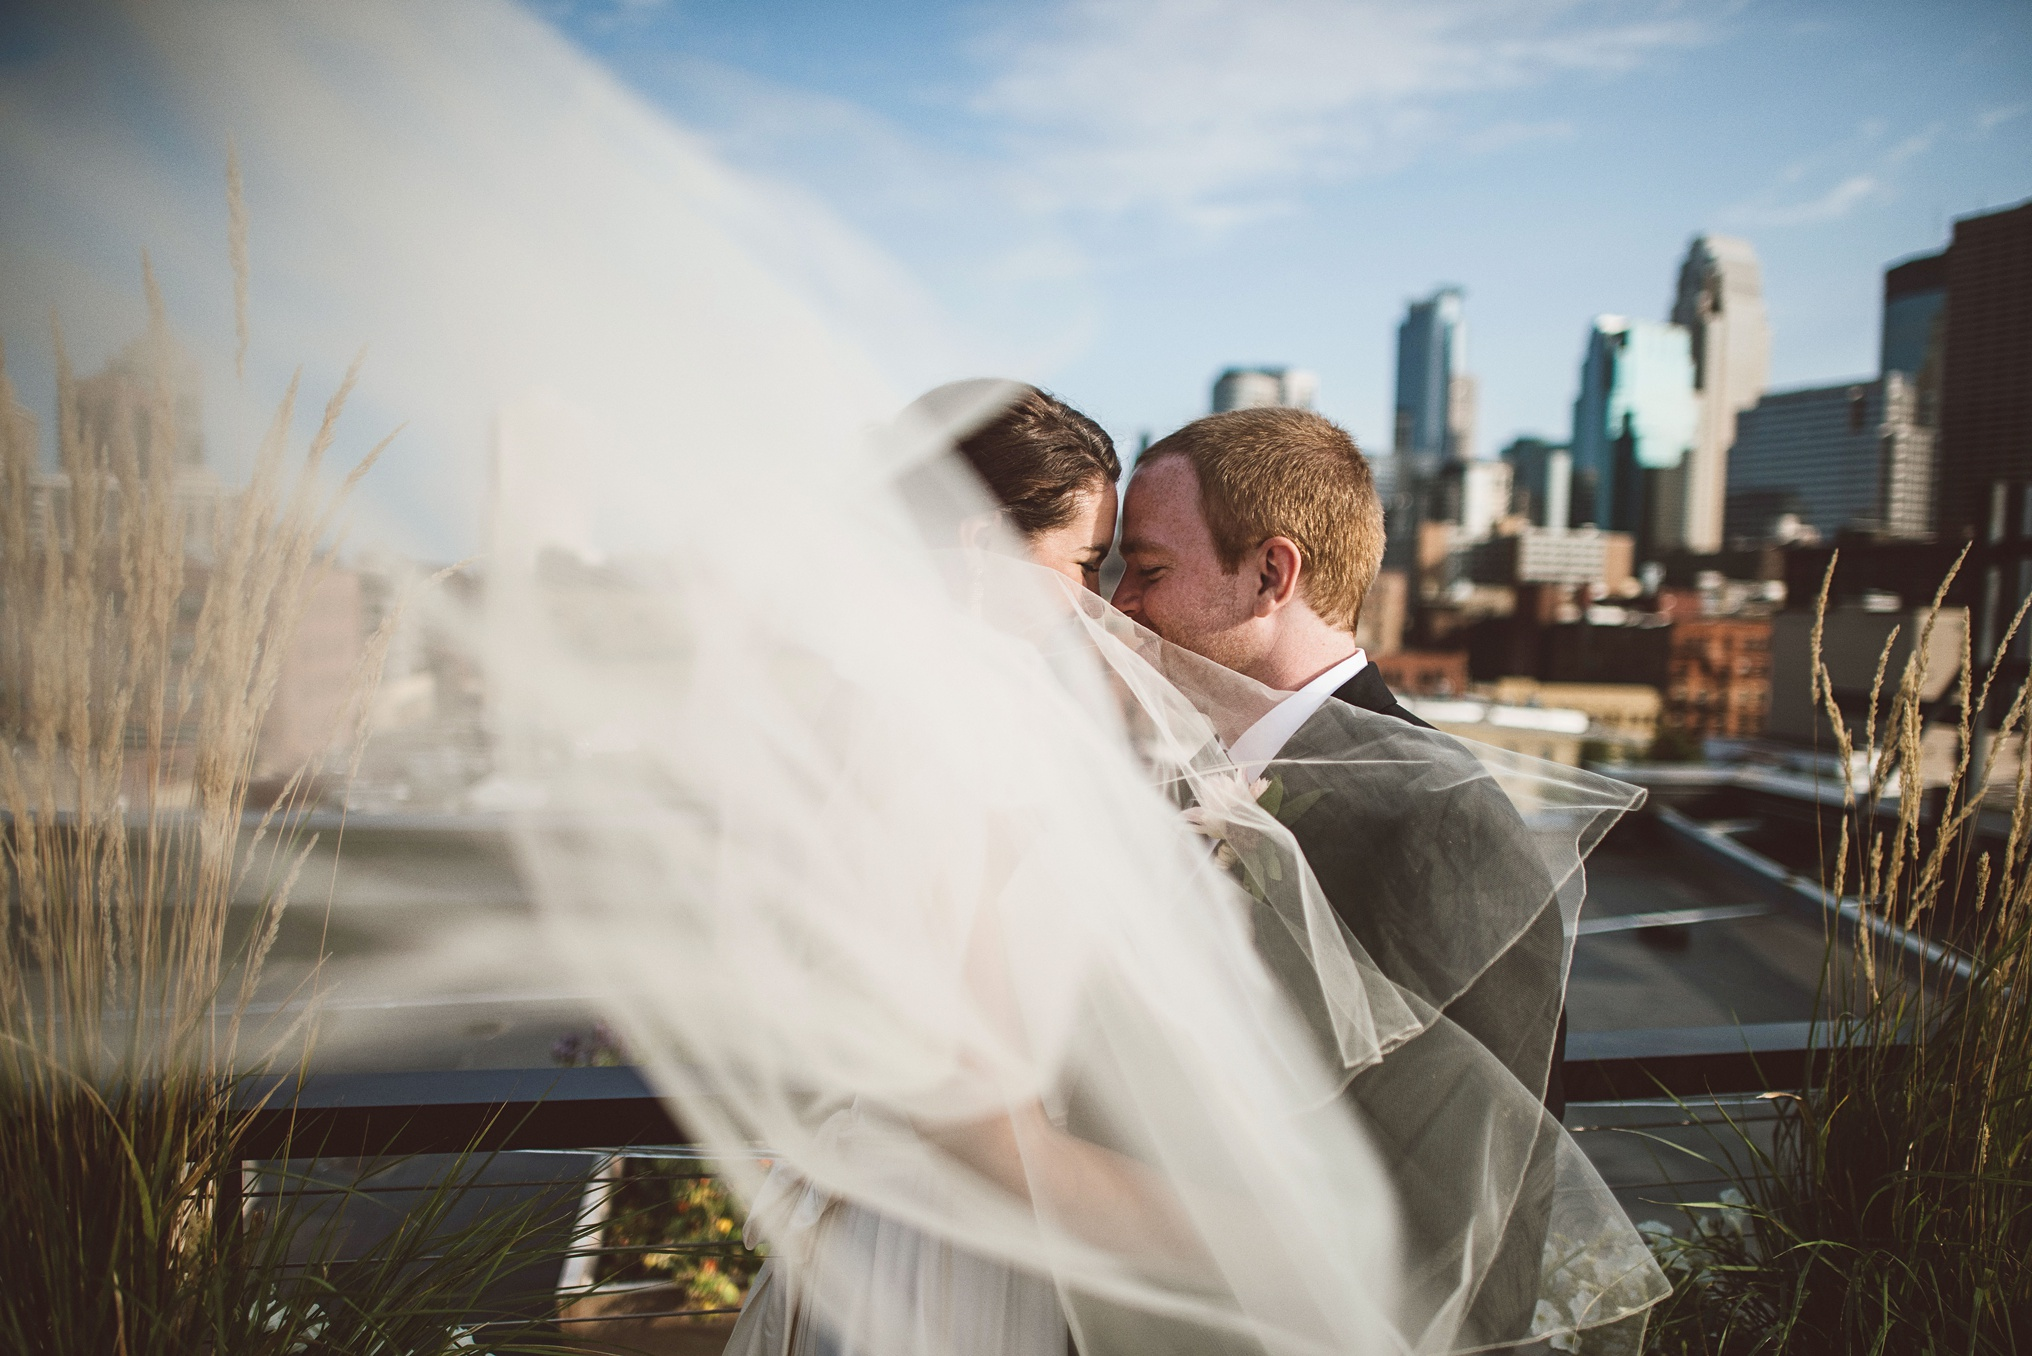 best_wedding_photography_2017_by_lucas_botz_photography_135.jpg